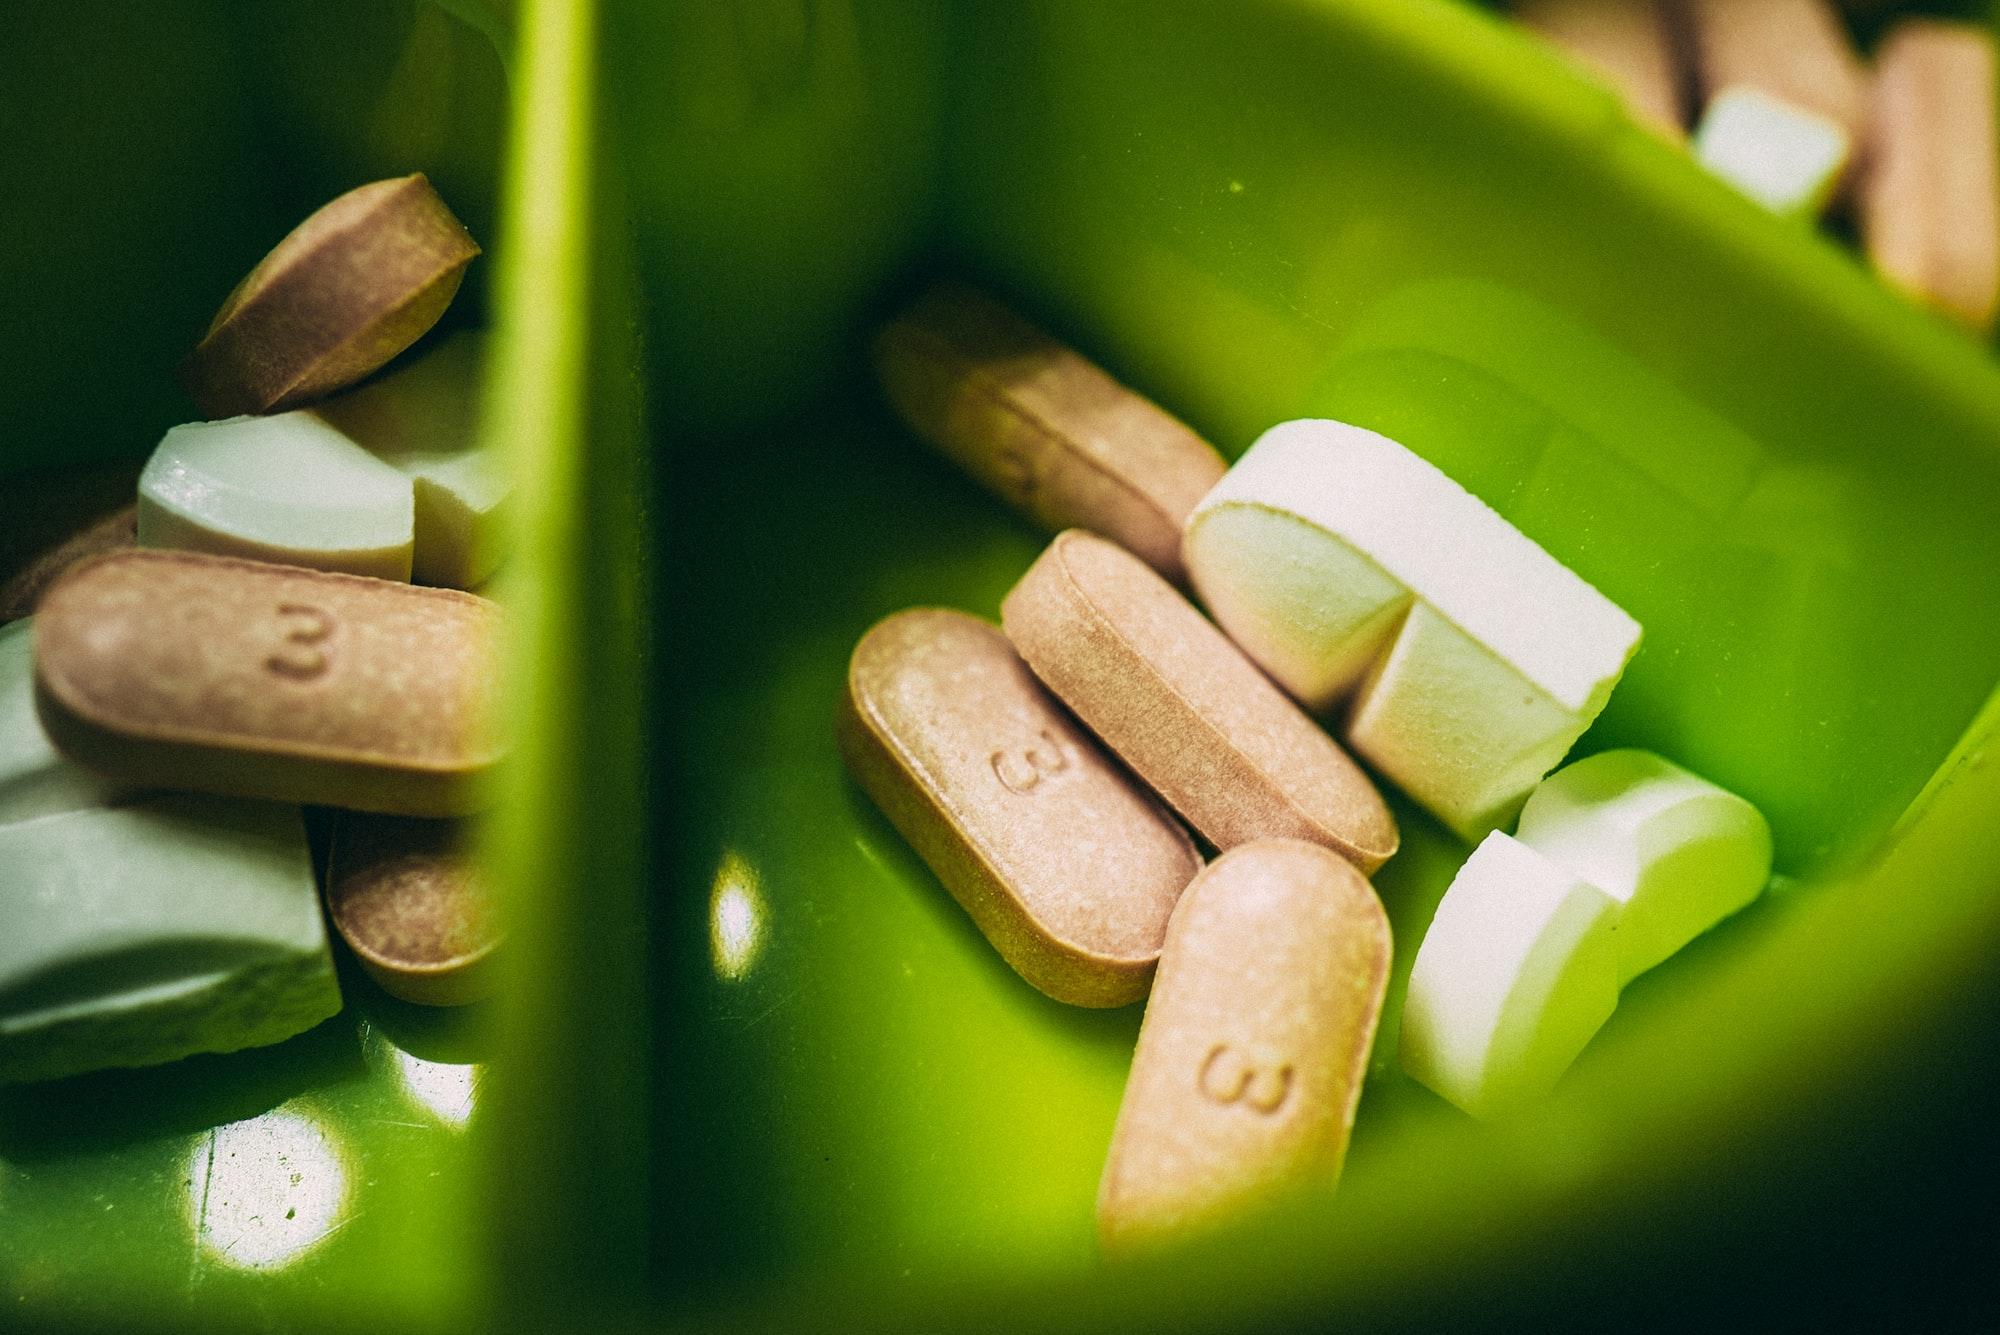 UNAJUA S5 E2: Can technology disrupt Nigeria's open drug markets? feat. Vivian Nwakah